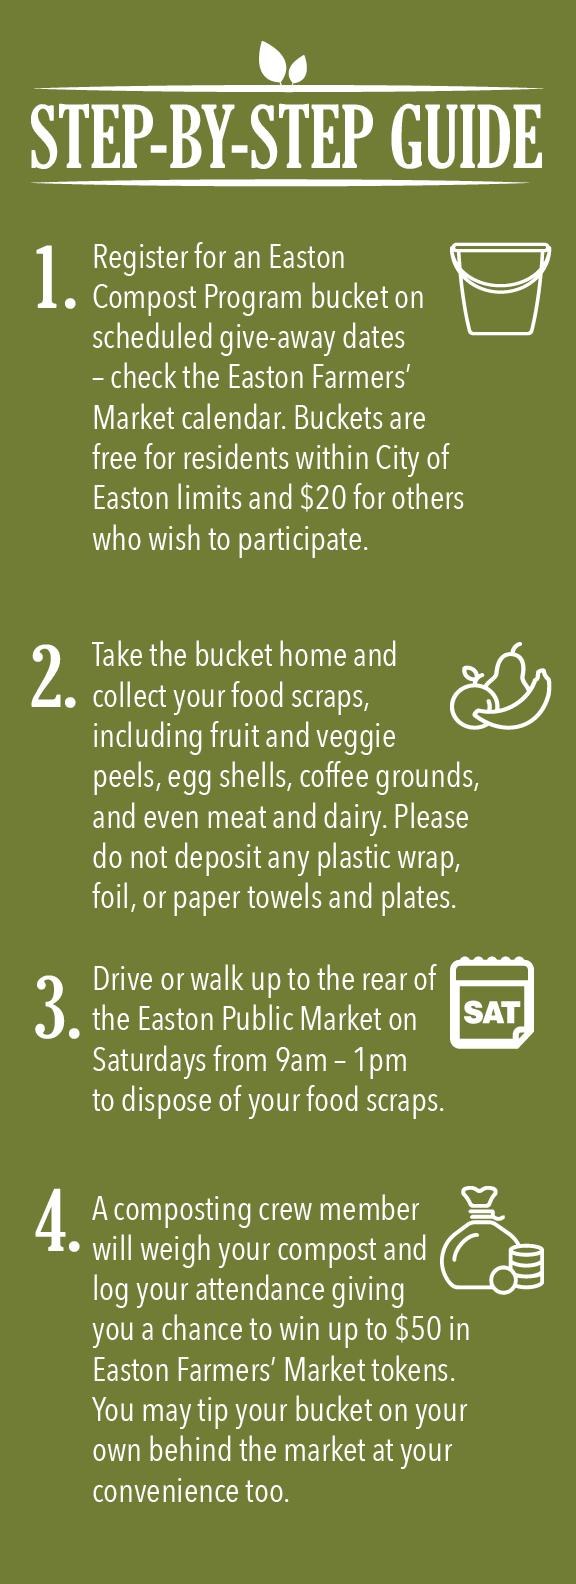 Easton Compost Program - Easton Farmers' Market